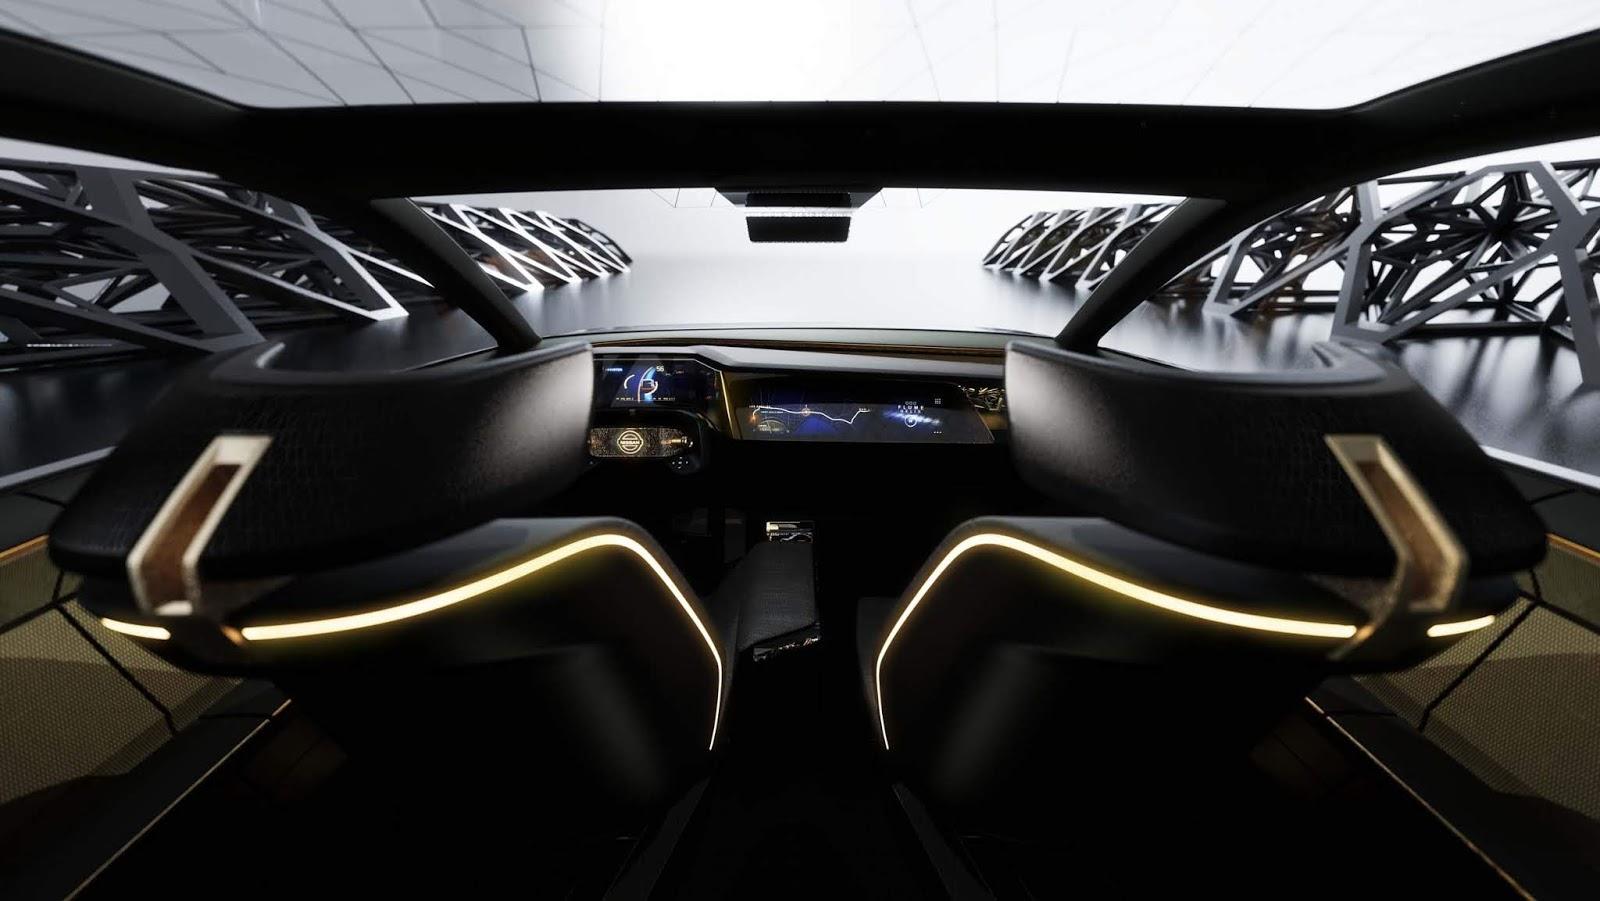 Nissan2BIMs2B252872529 Σου αρέσει το τετρακίνητο σπορ σεντάν της Nissan; Electric cars, Nissan, video, videos, zblog, αυτόνομα, Αυτόνομη οδήγηση, βίντεο, τετρακίνητα, τετρακίνητο